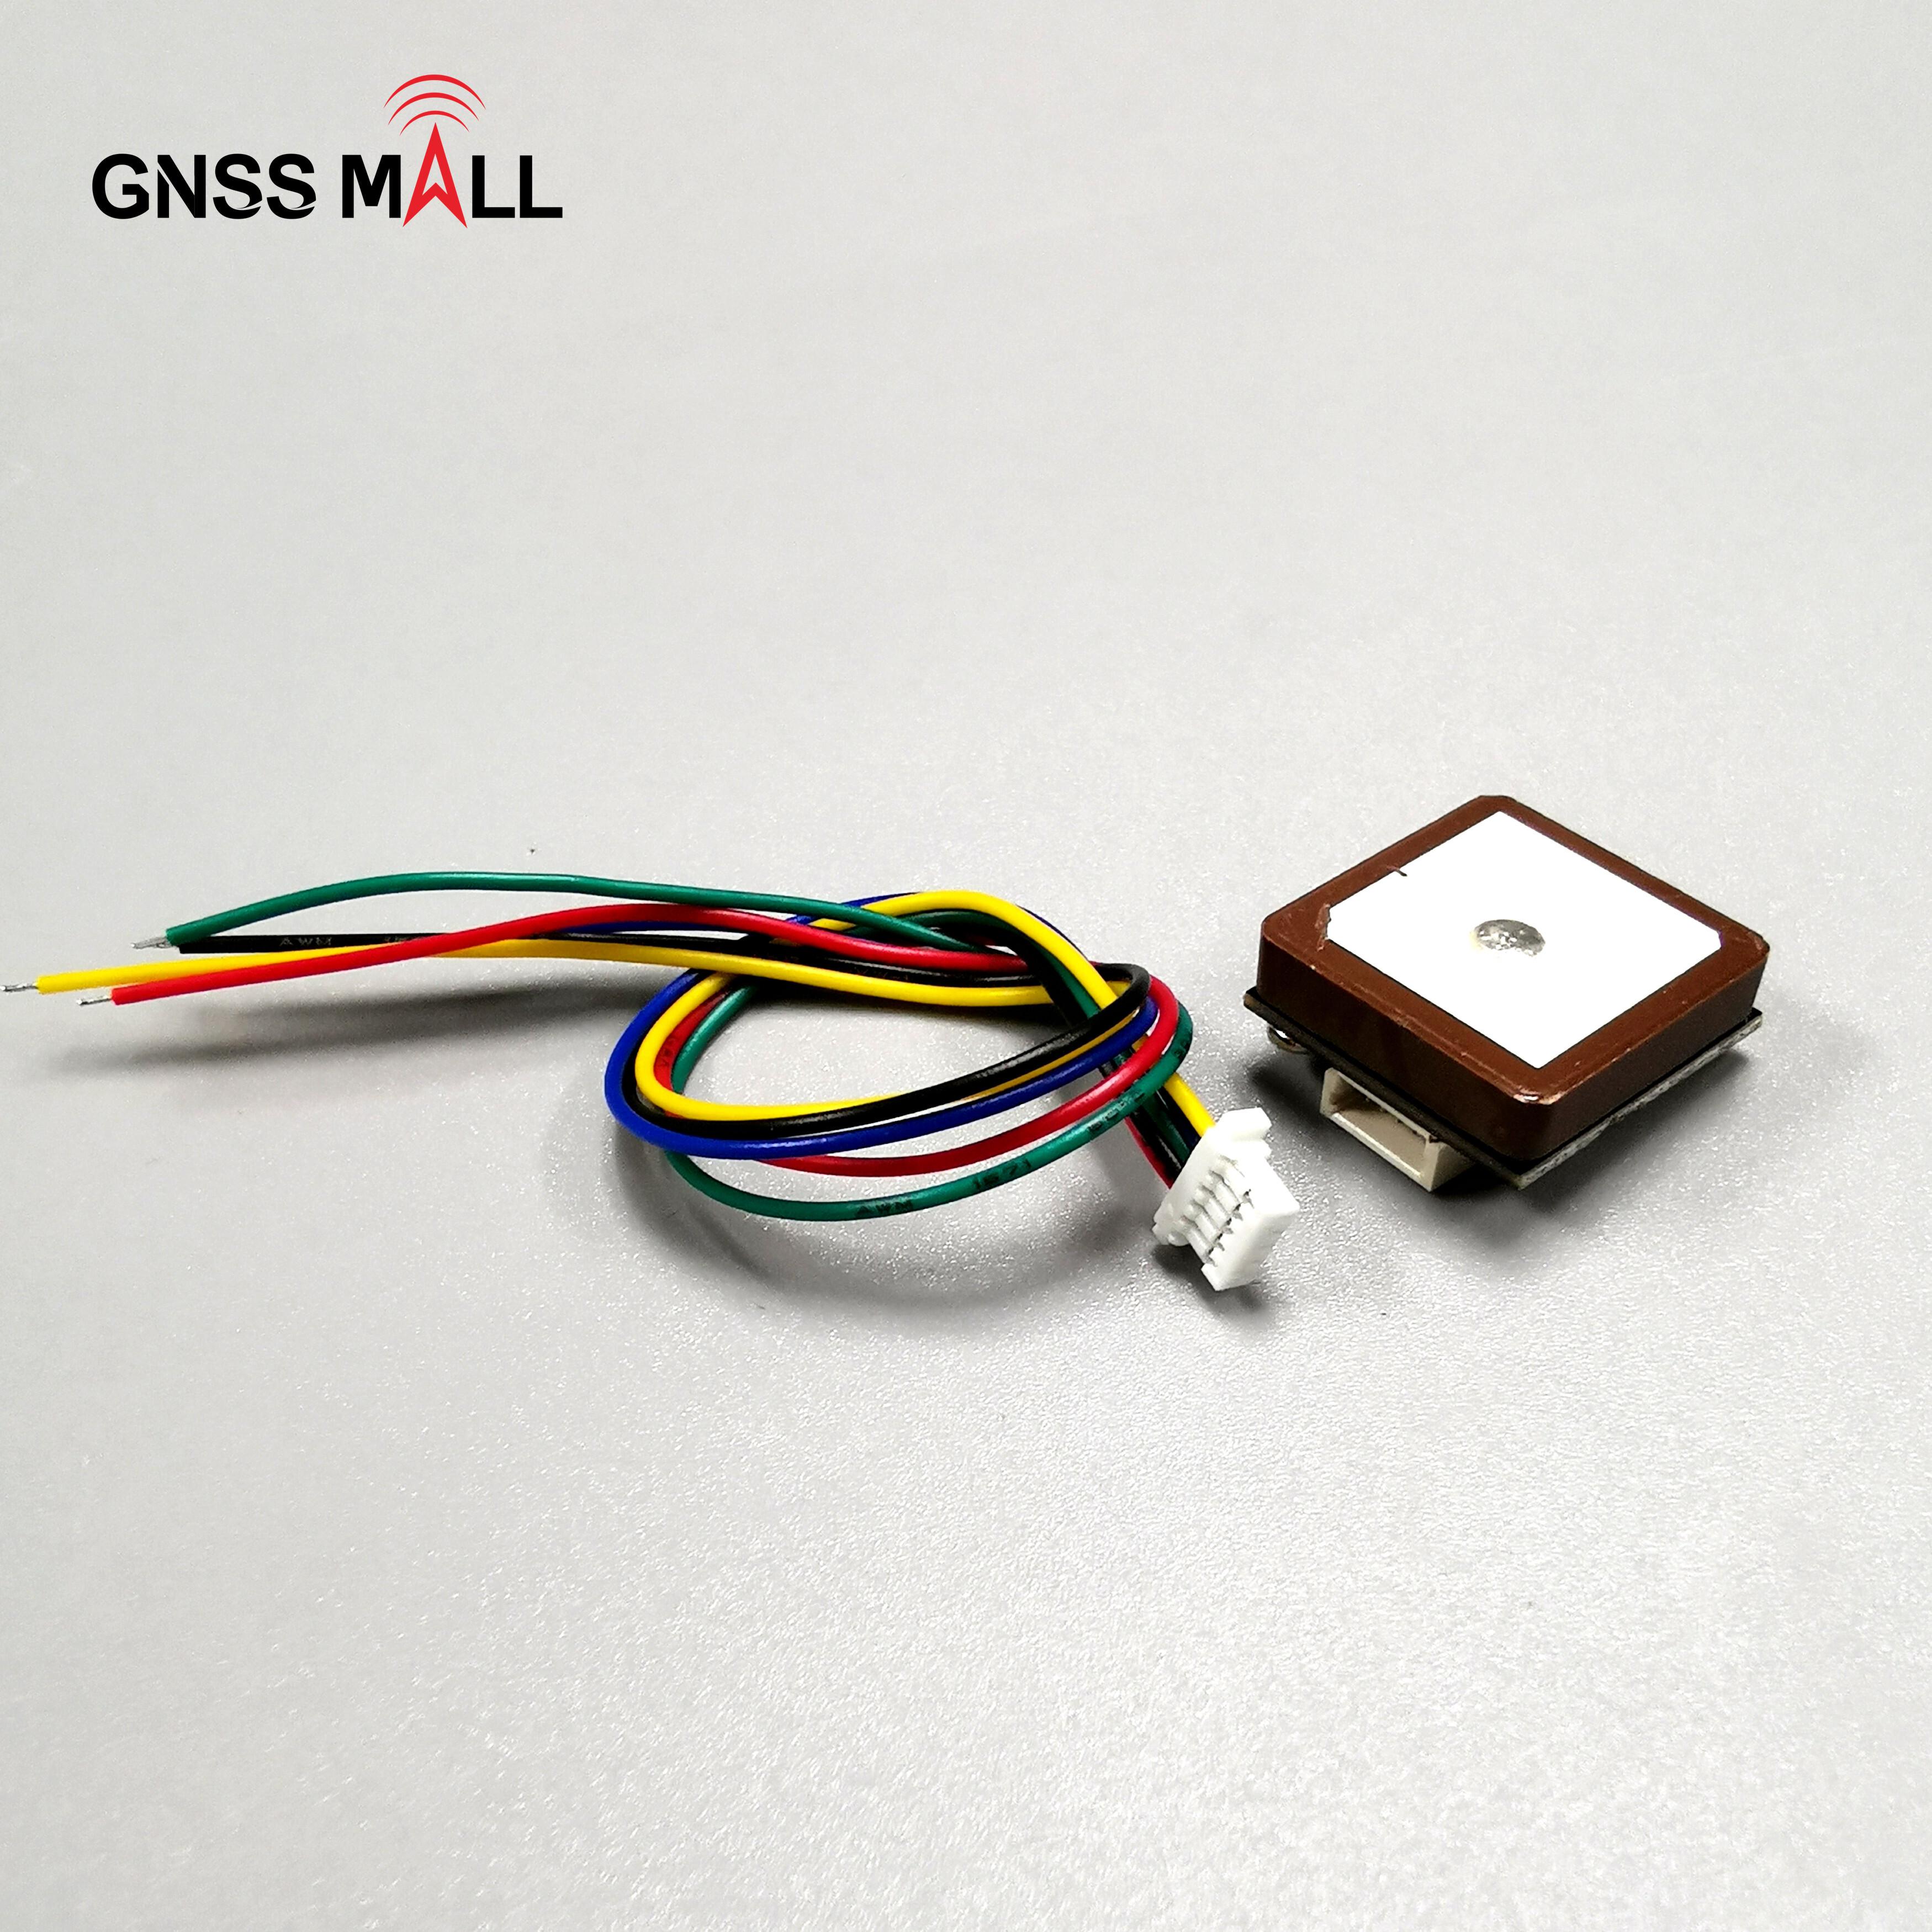 small size gps drone UART level GPS Module GPS GLONASS Dual-mode uav GNSS module,GPS module antenna,built in Flash topgnss